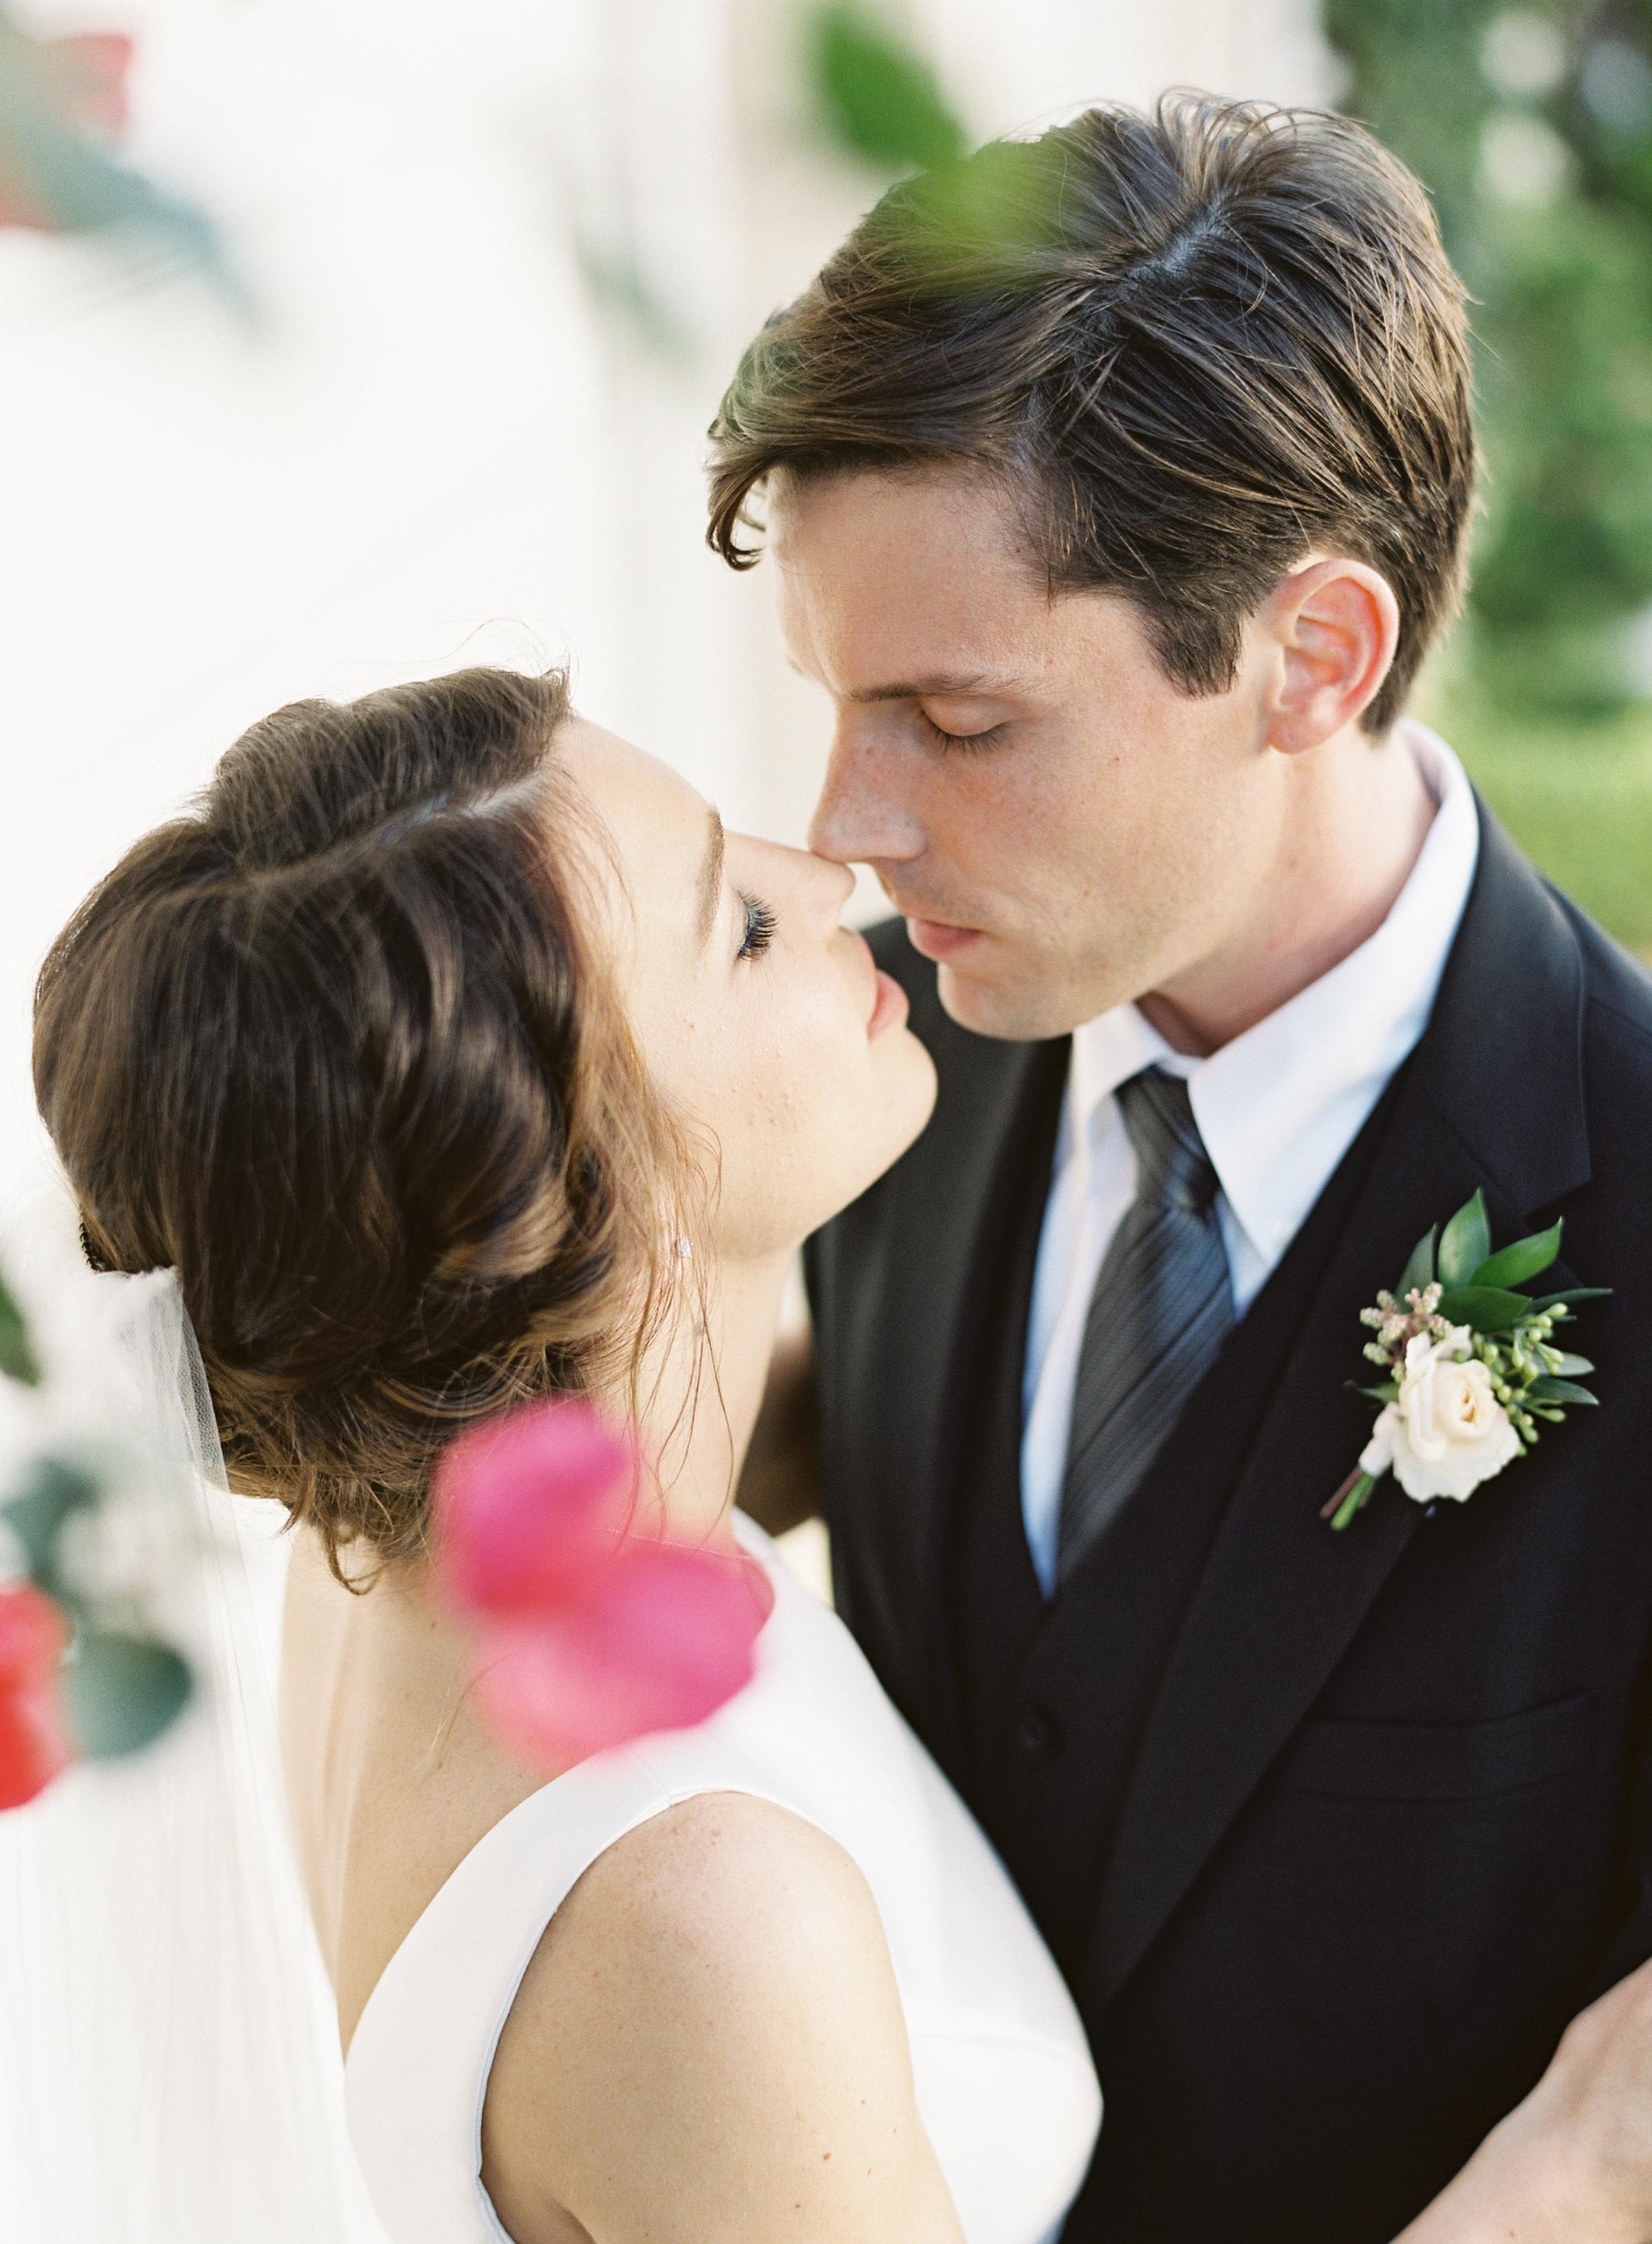 Meghan Mehan Photography - California Wedding Photographer | San Francisco City Hall Wedding 060.jpg